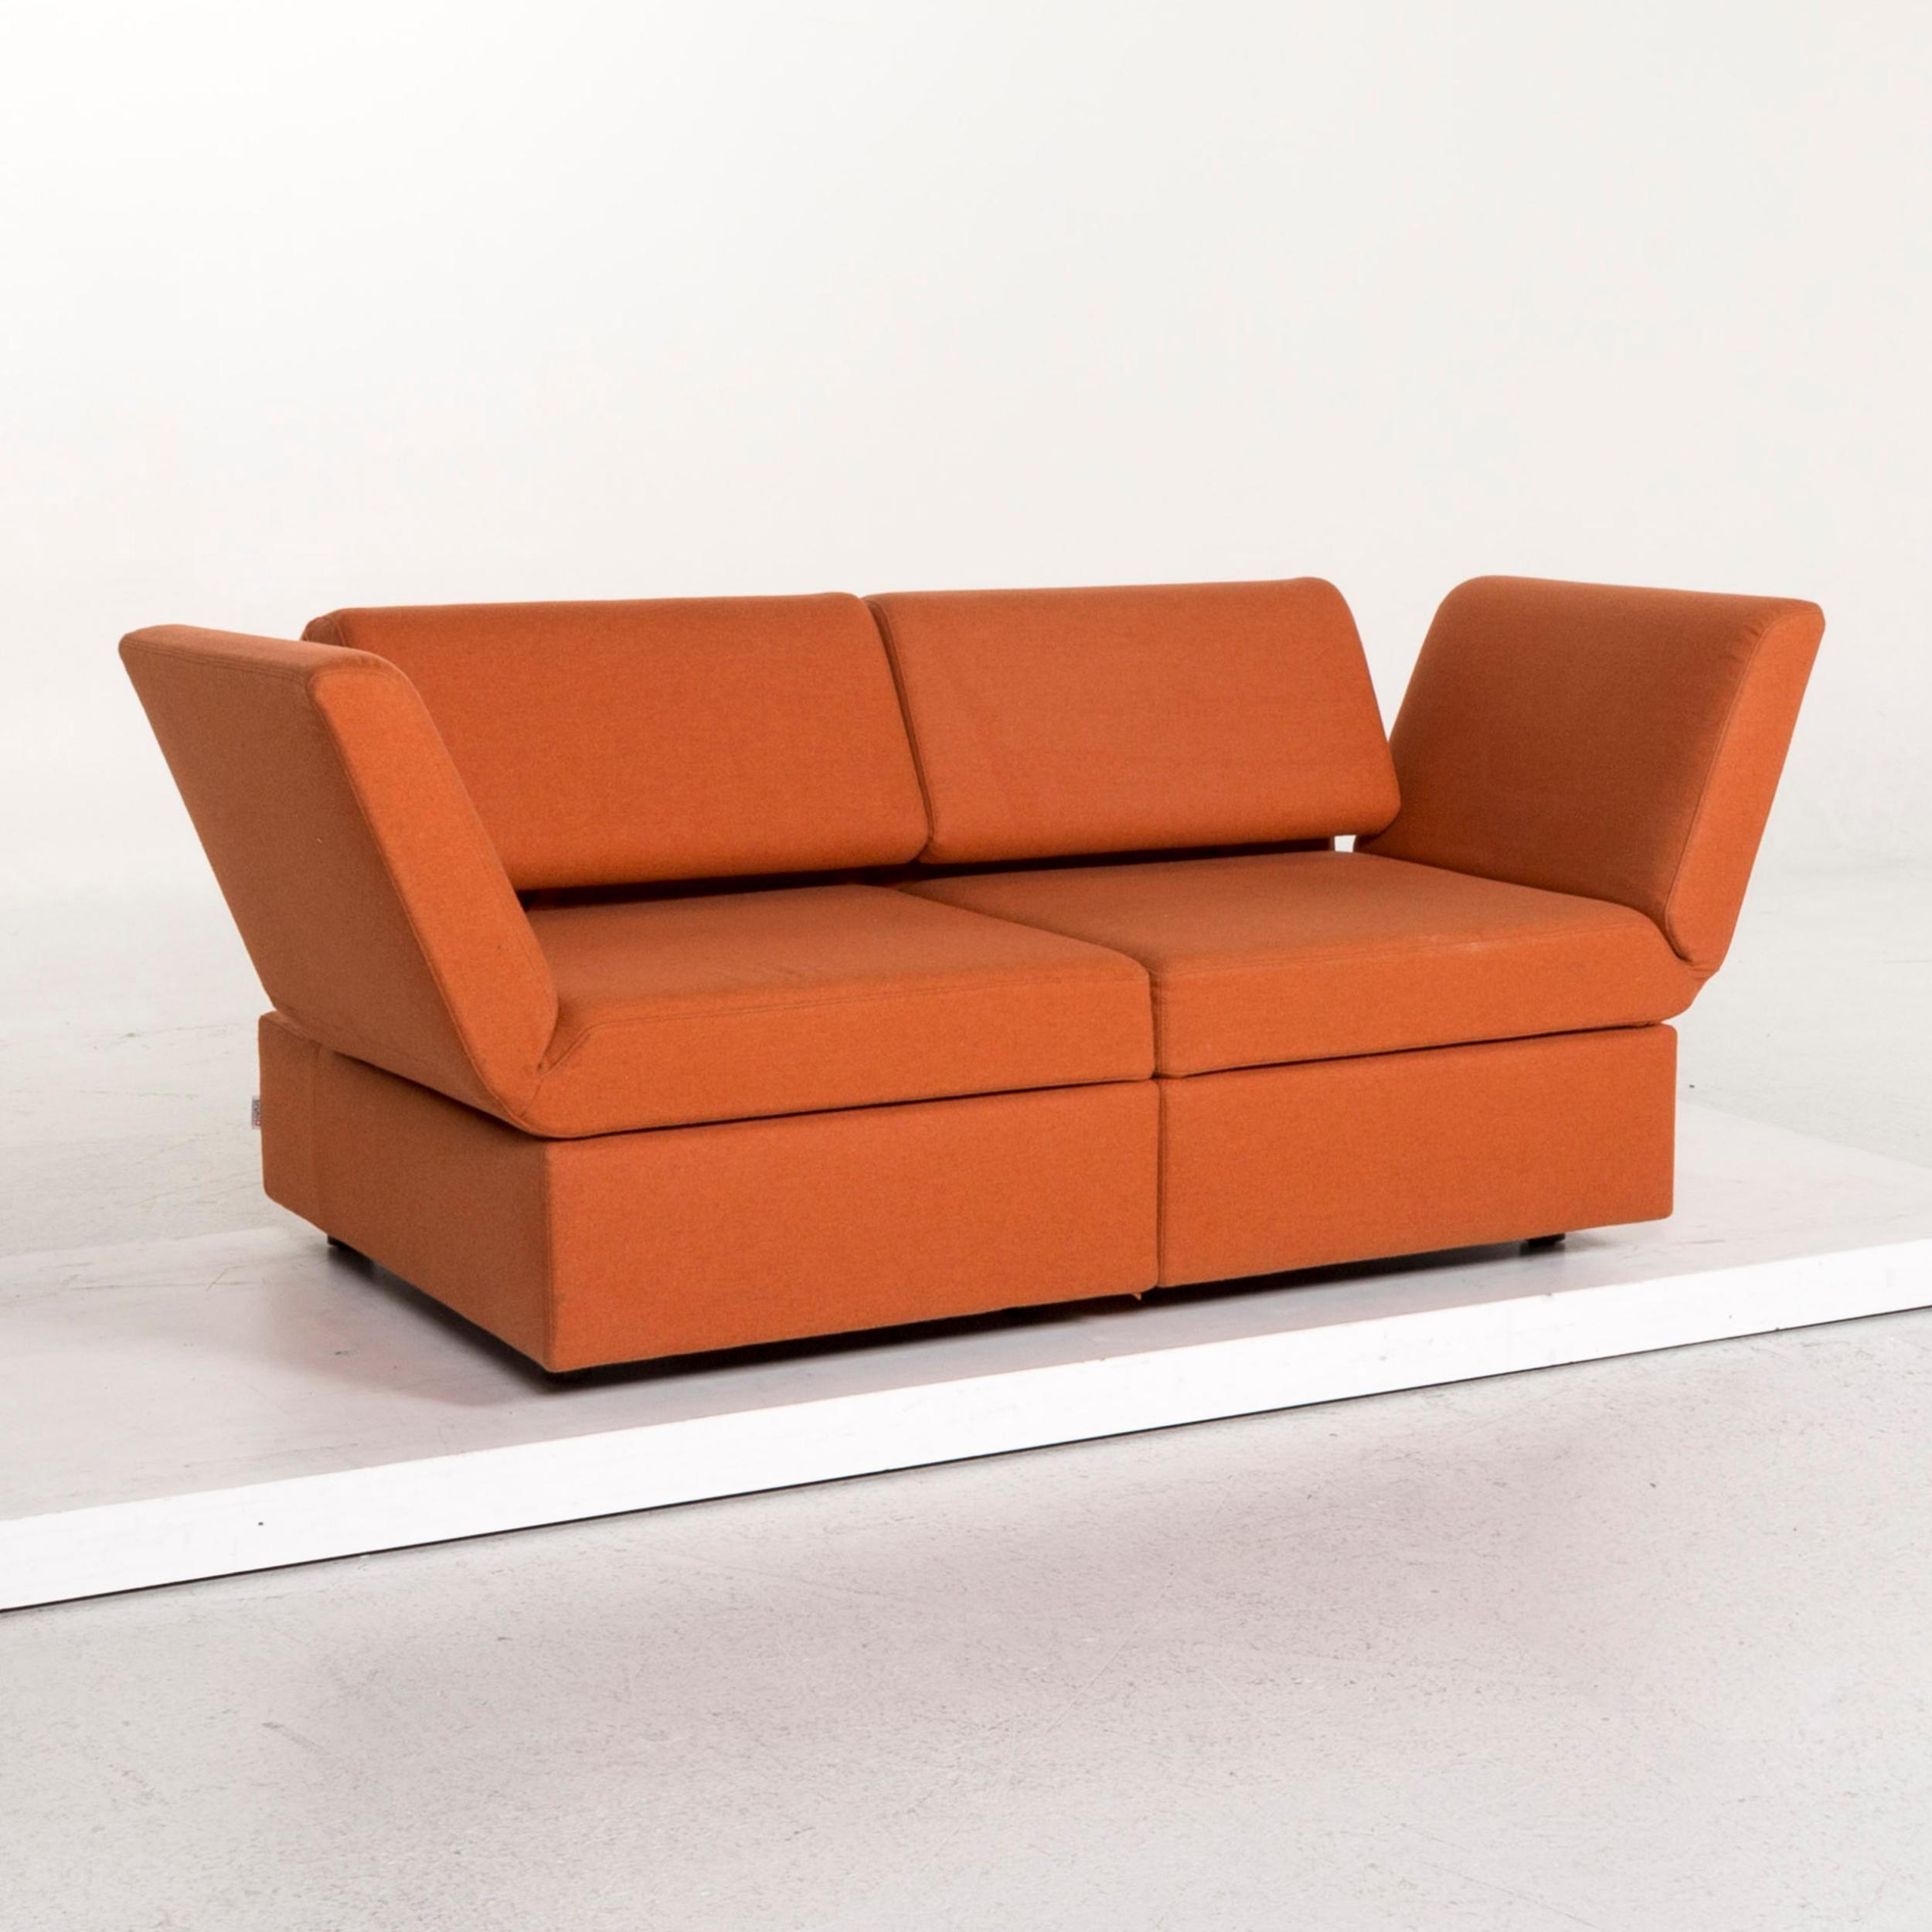 Brühl and Sippold Brühl Clip Fabric Sofa Orange Two Seat ...